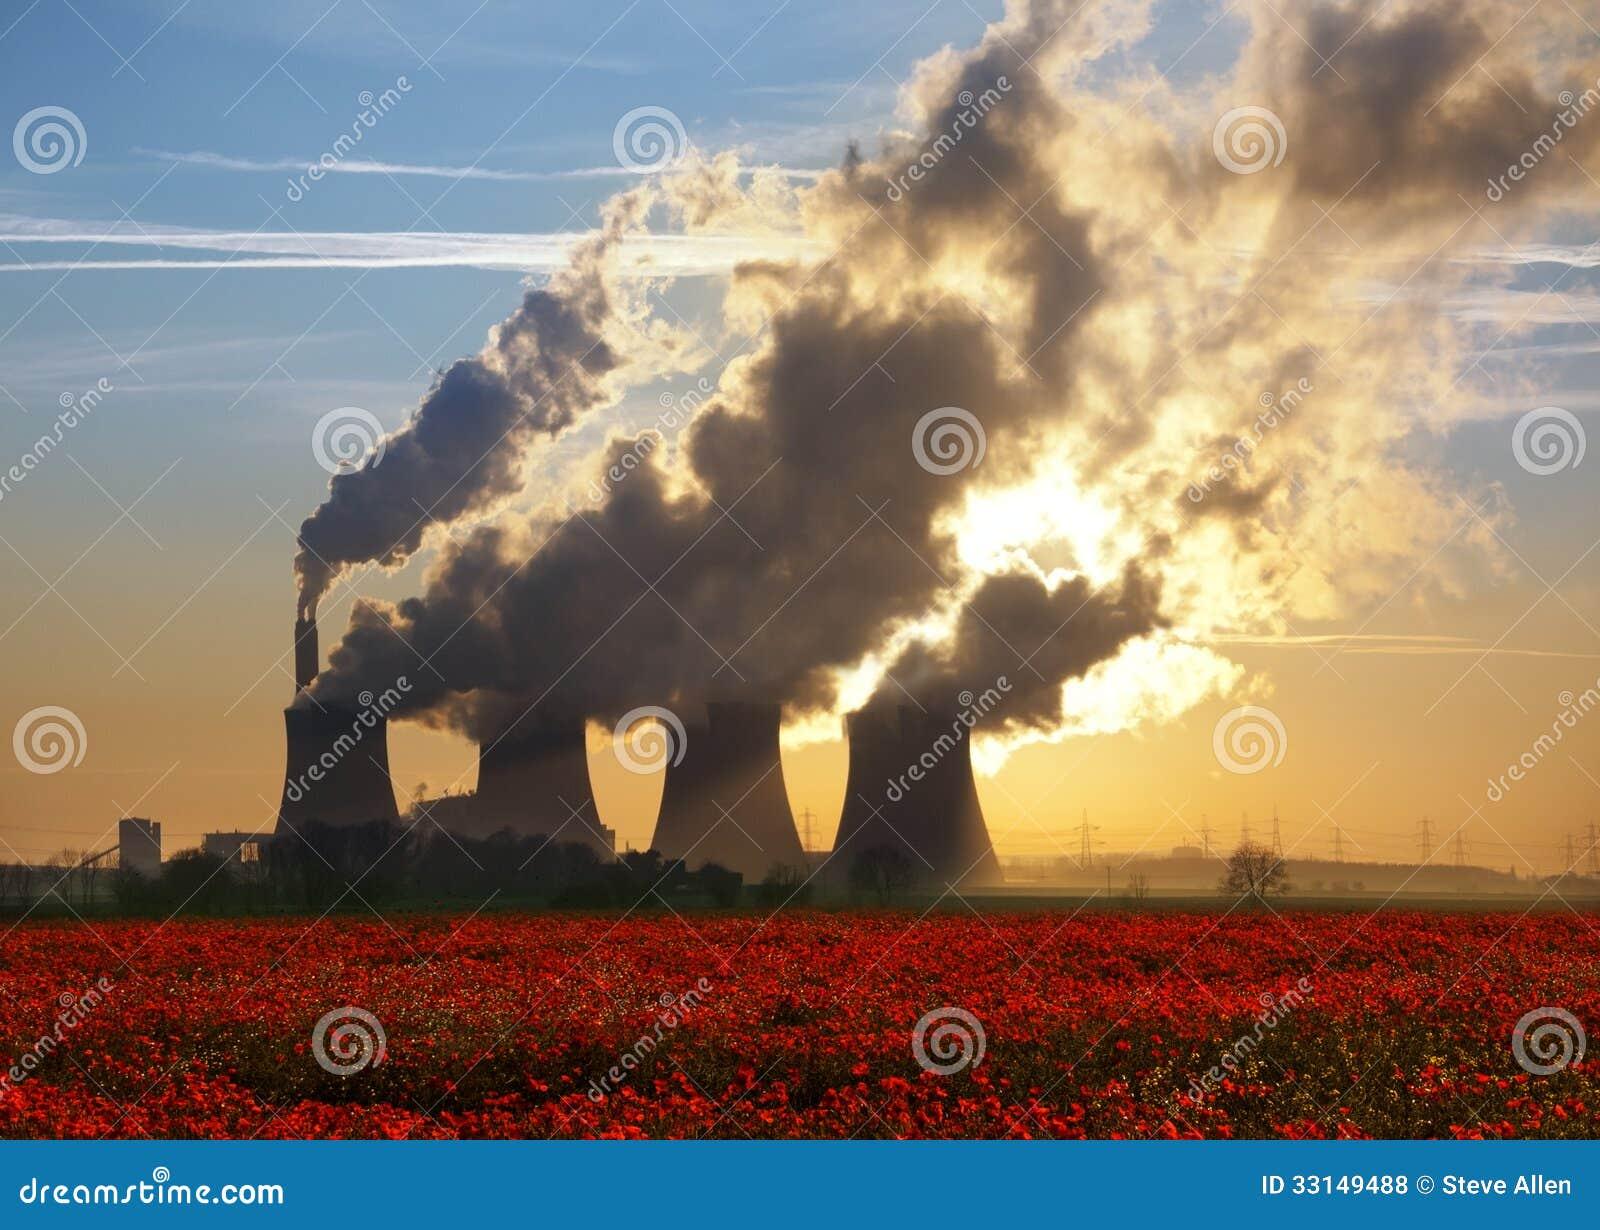 Kohle abgefeuerte Energie-Anlage und Poppy Field